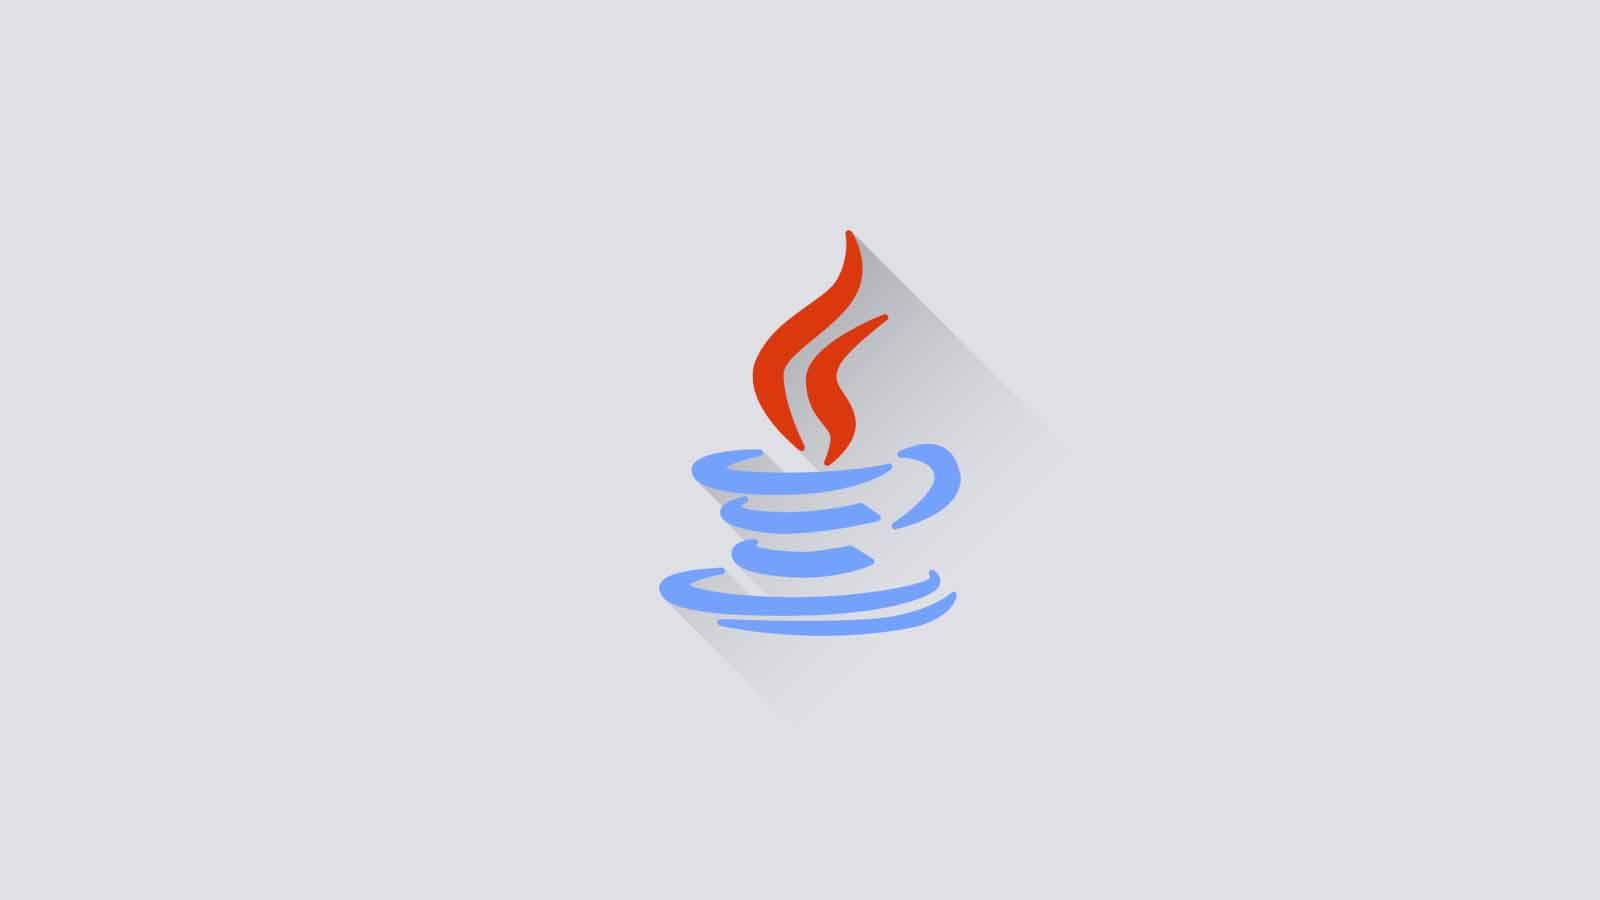 Daftar Isi - Java